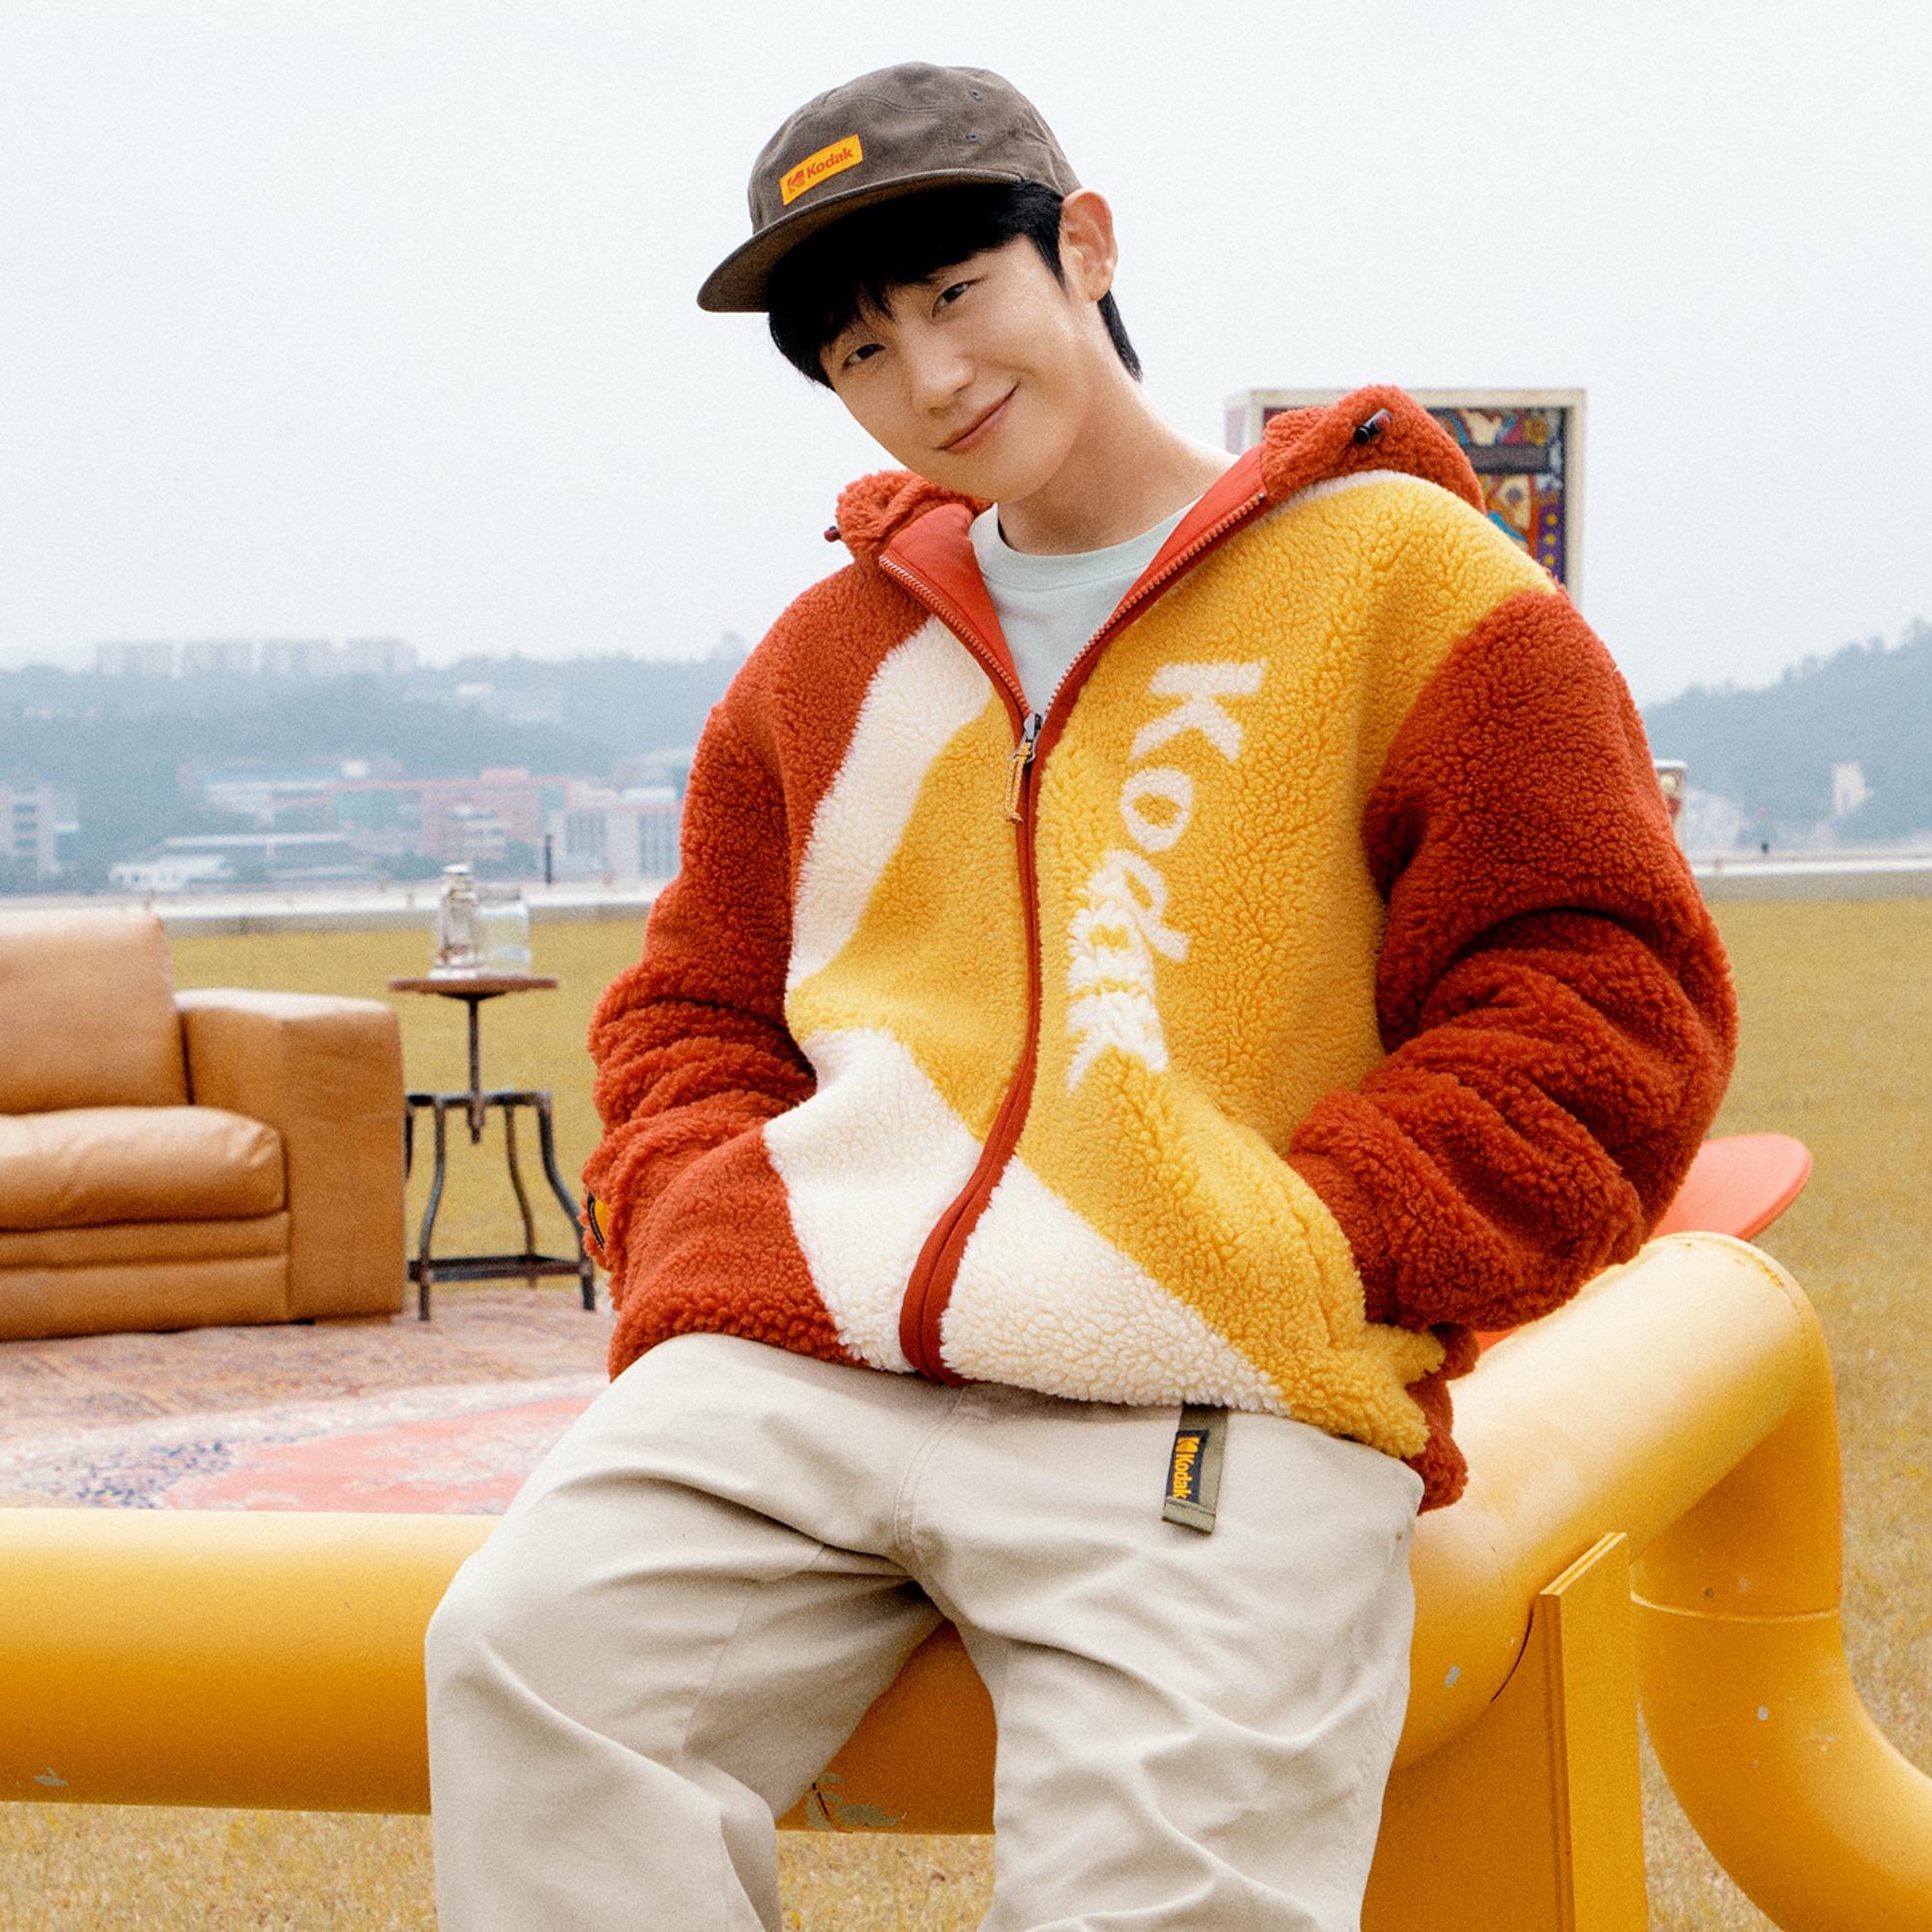 jung-hae-in-selected-as-first-advertising-model-for-kodak-apparel-3